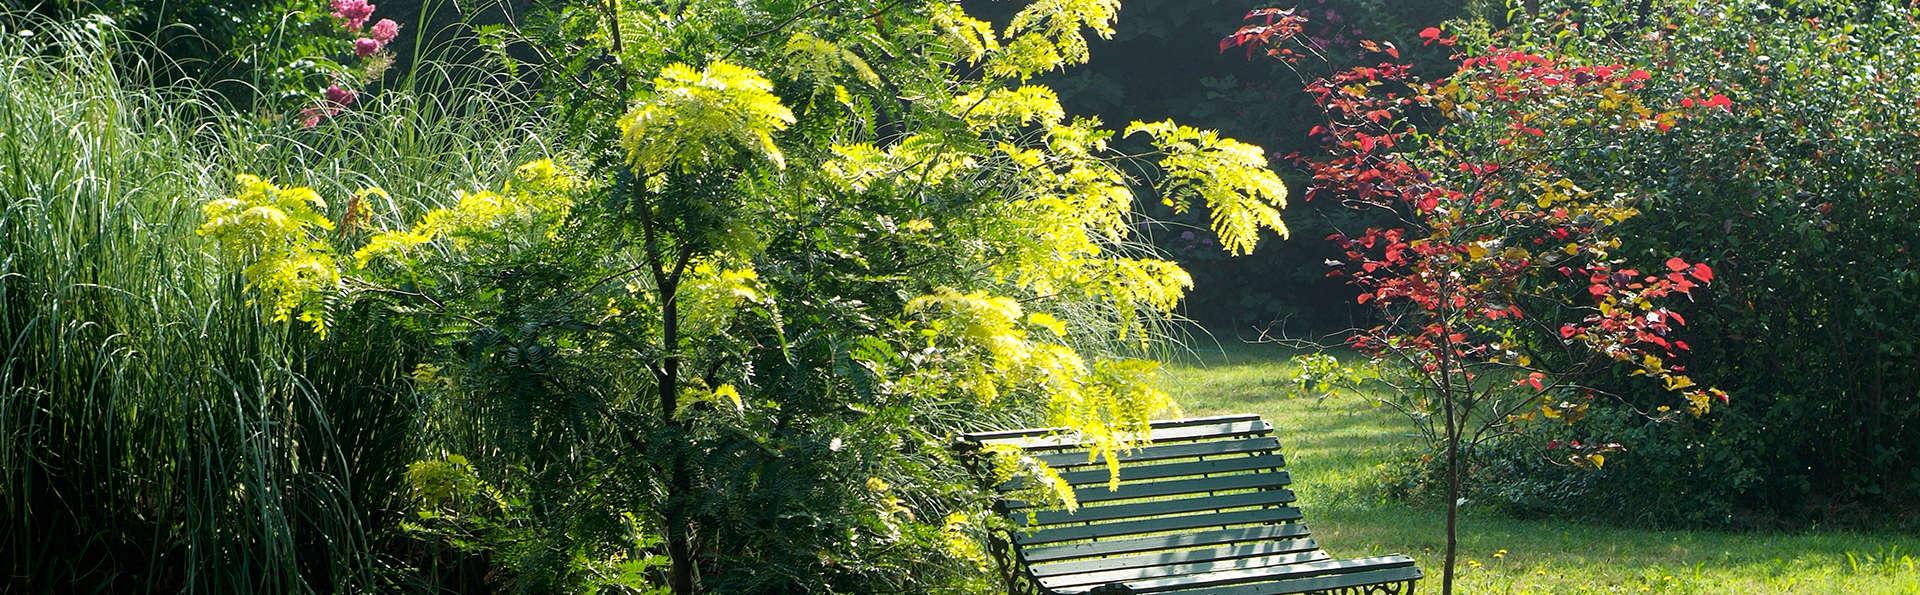 Mas de La Chapelle  - EDIT_garden1.jpg